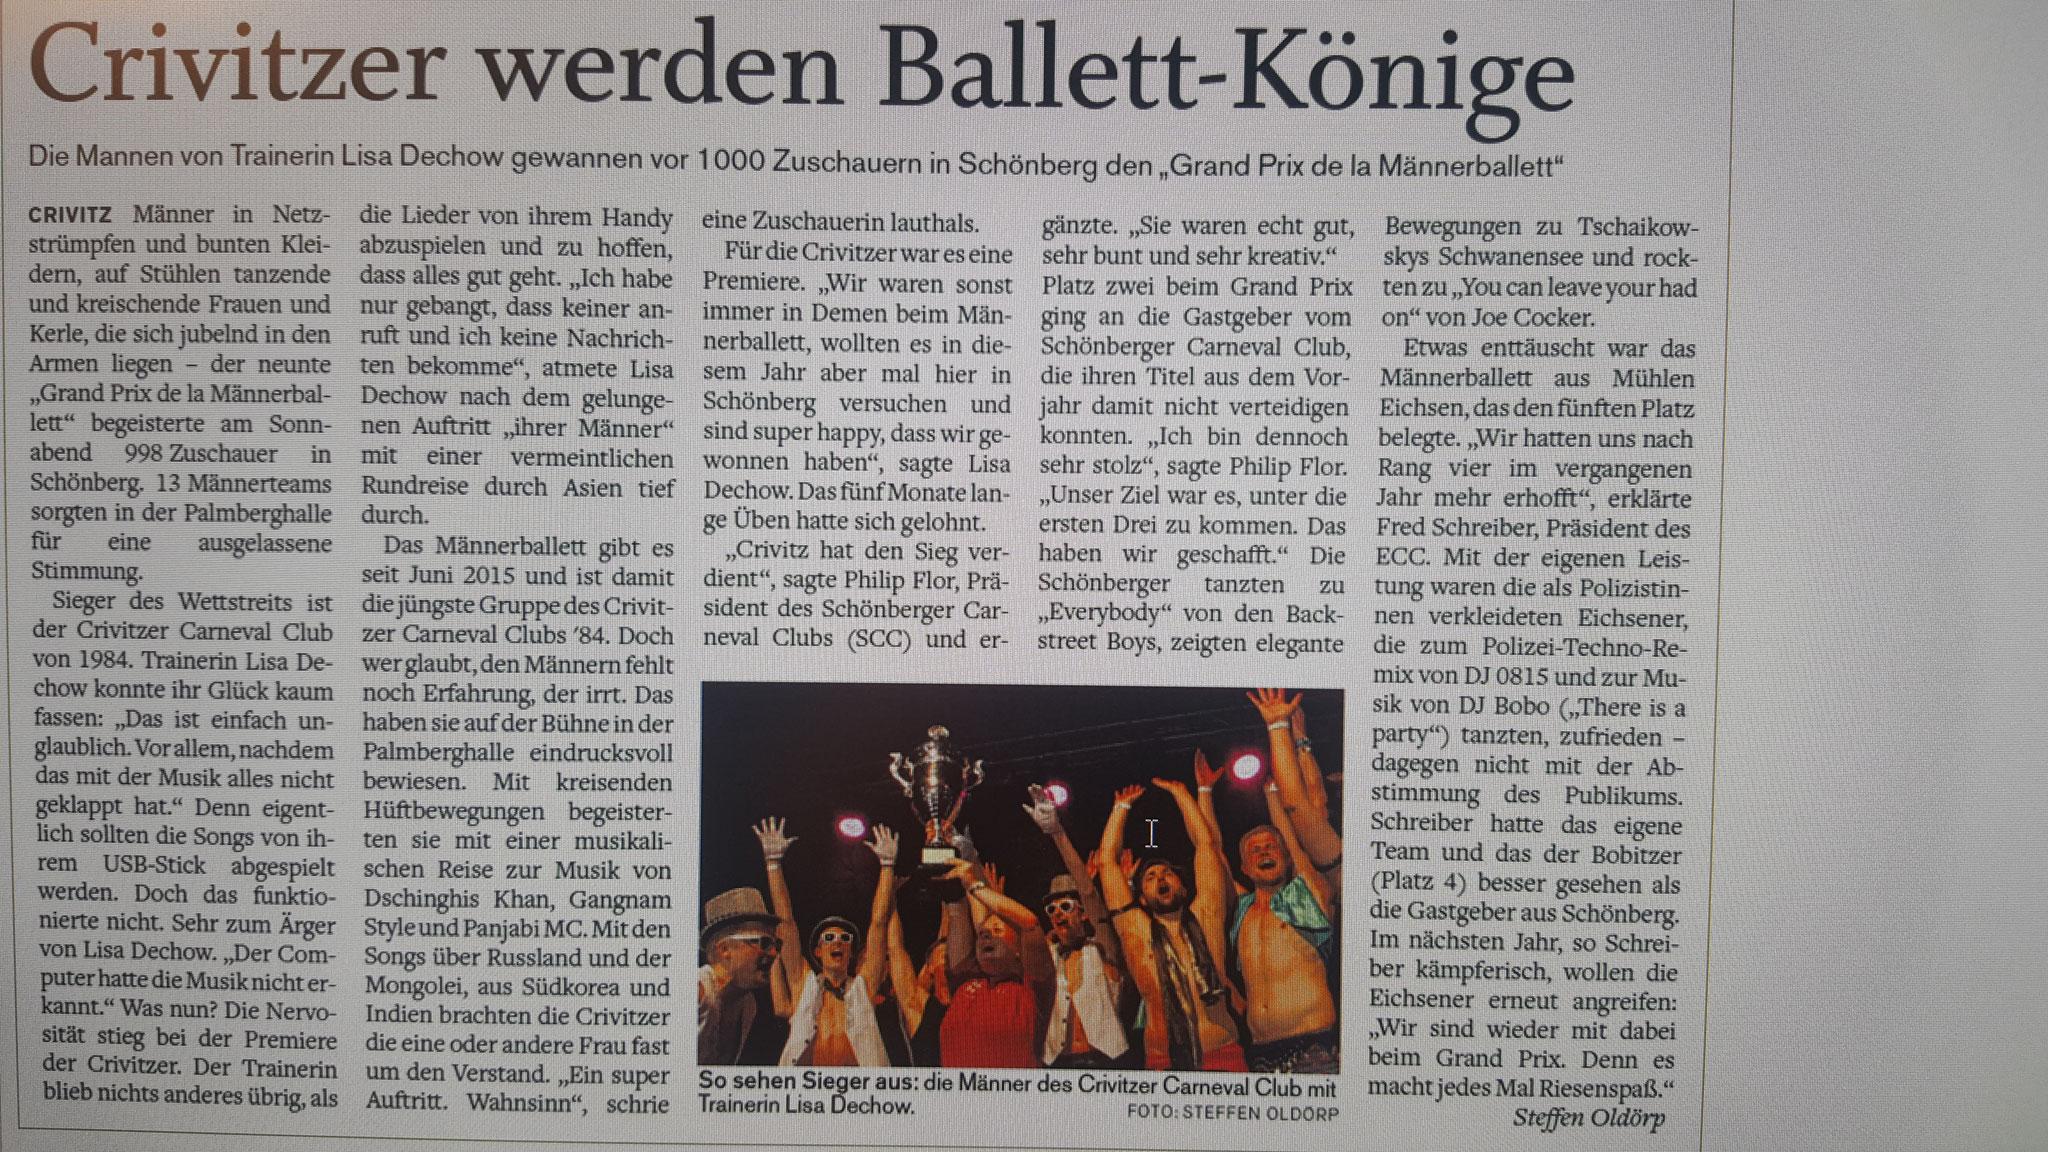 10.03.2018 1. Platz Grand Prix de la Männerballett in Schönberg